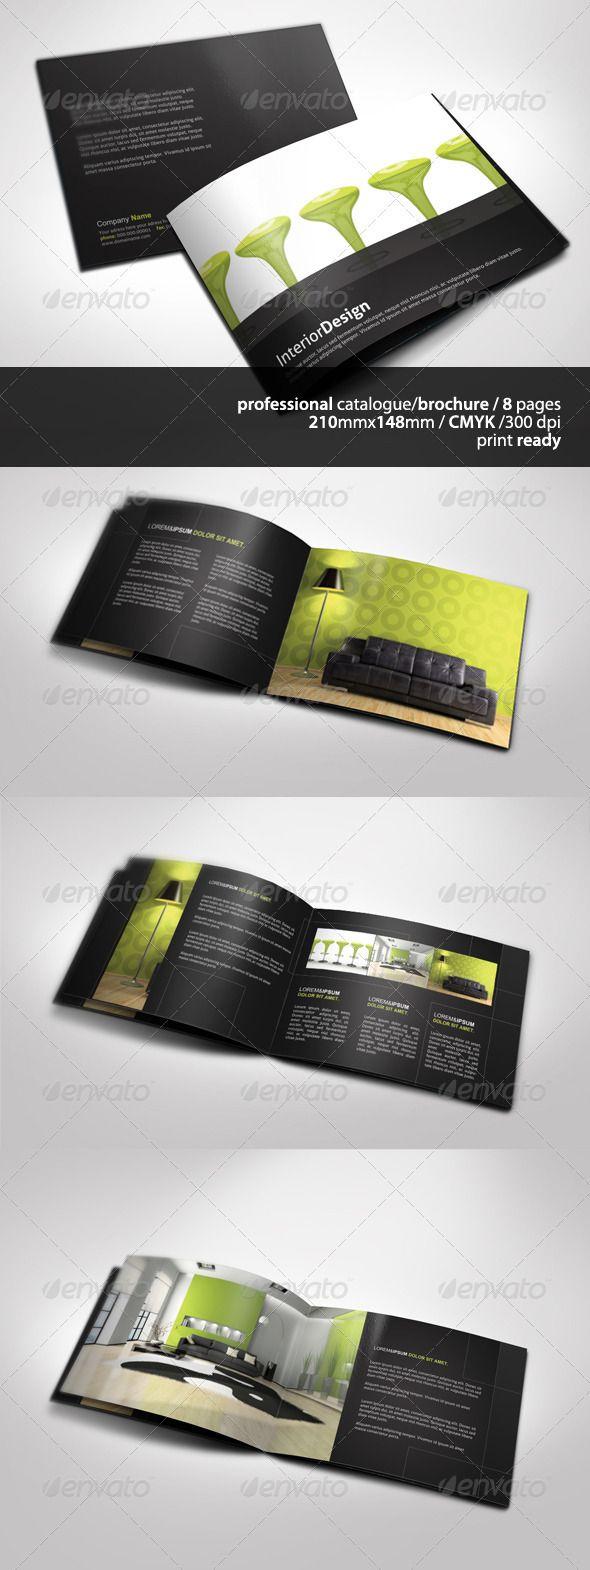 a5 brochure template - a5 brochure catalogue design brochure template and fonts